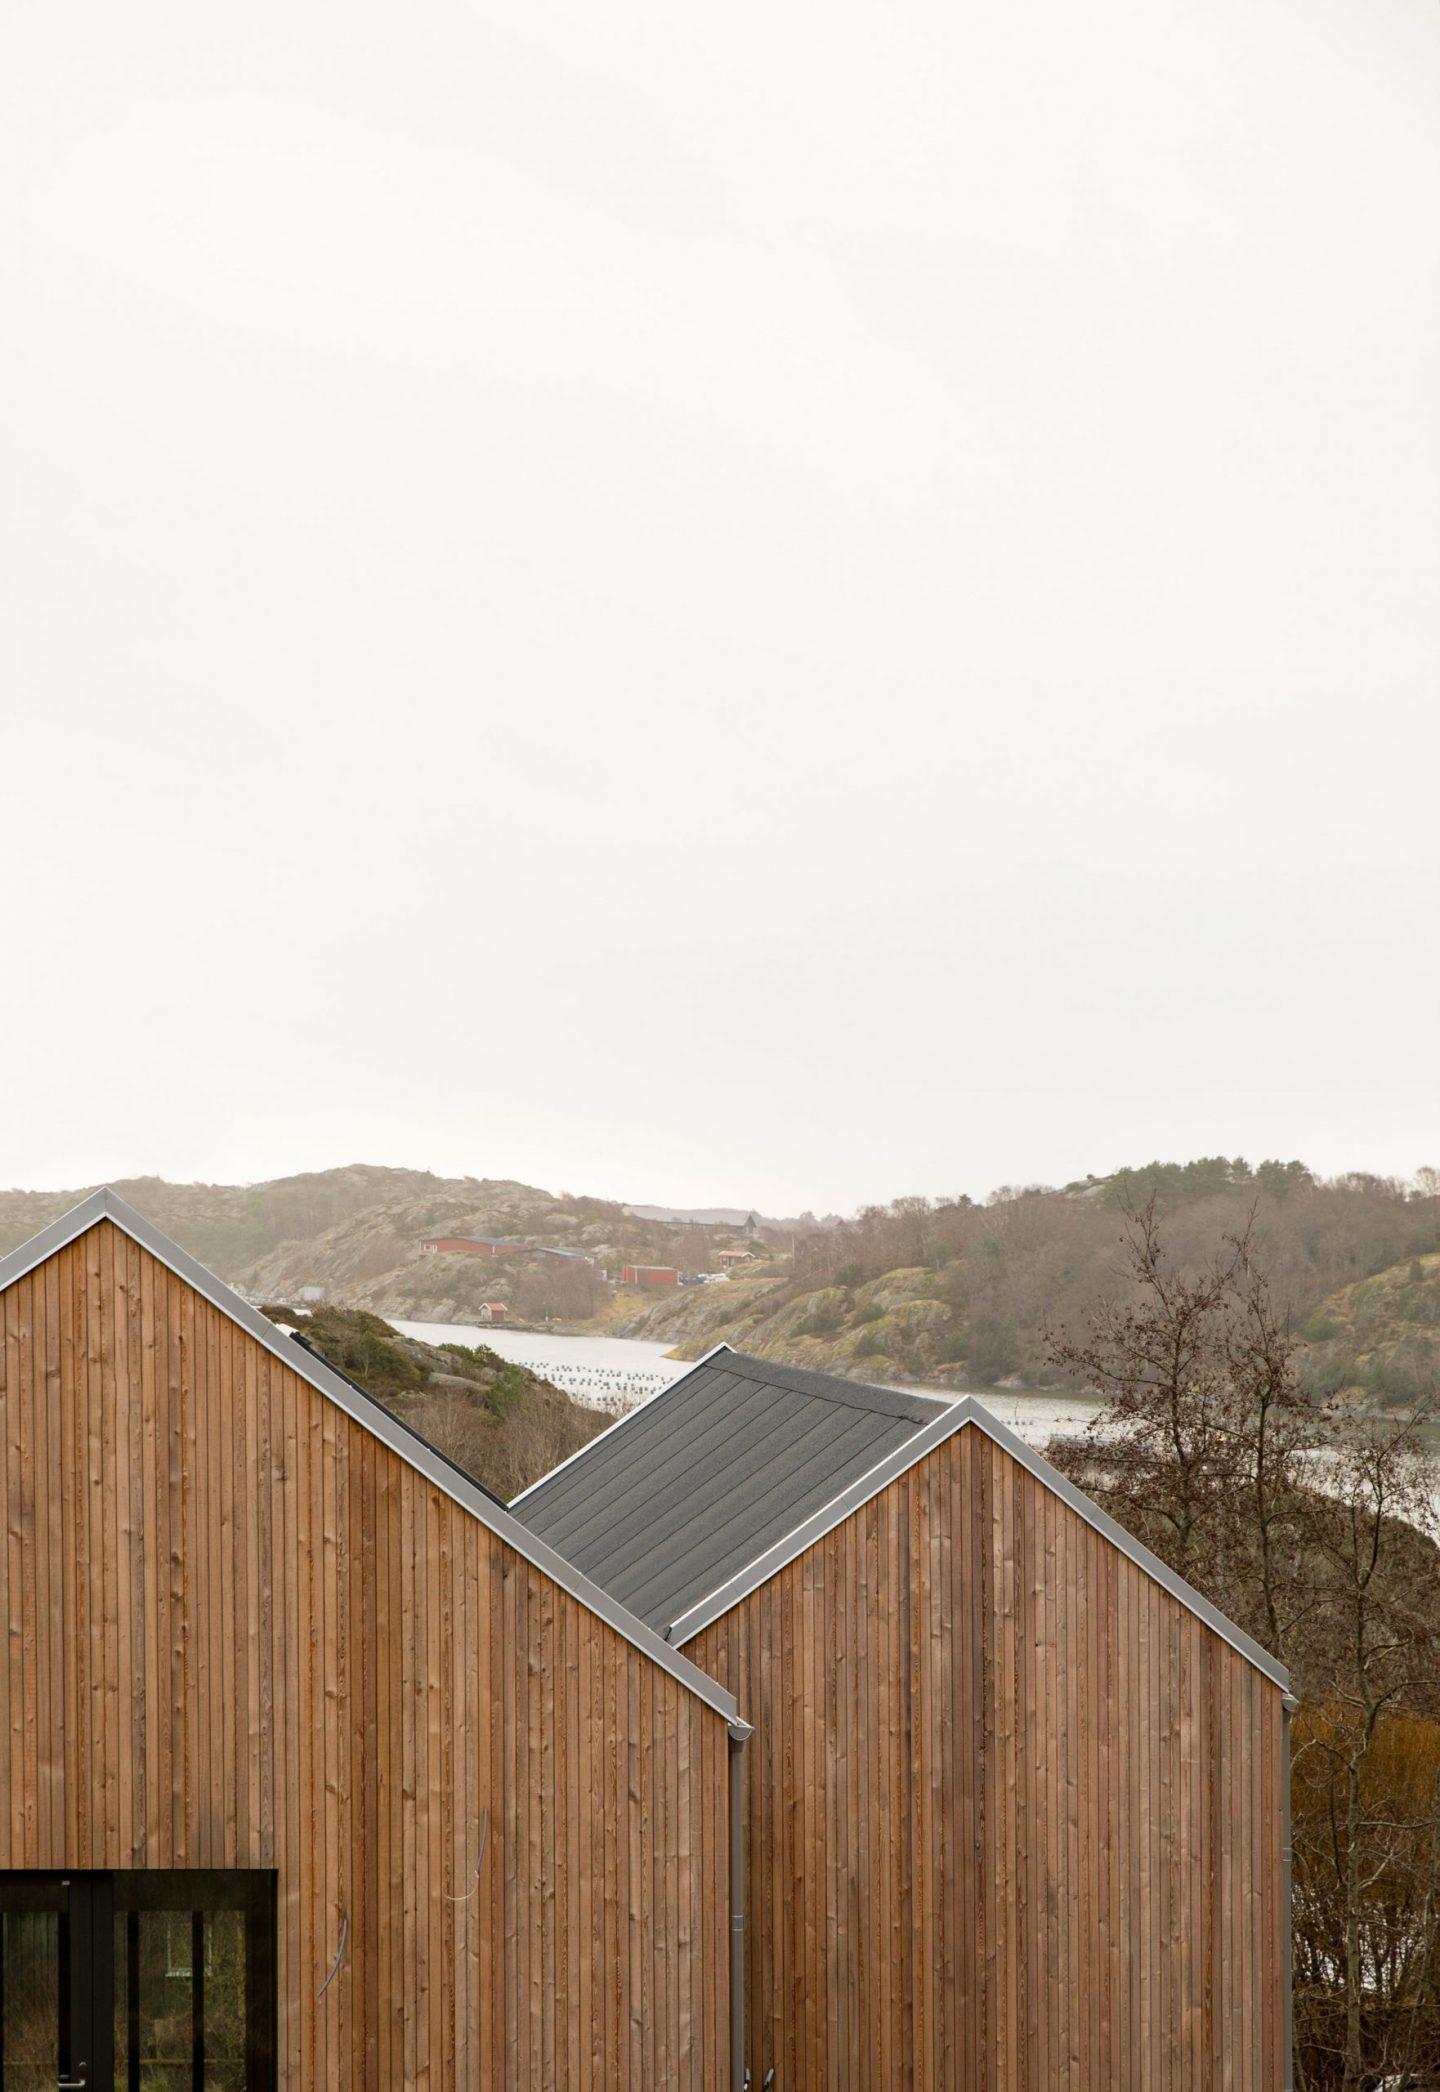 IGNANT-Architecture-Norm-Architects-Archipelago-House-05